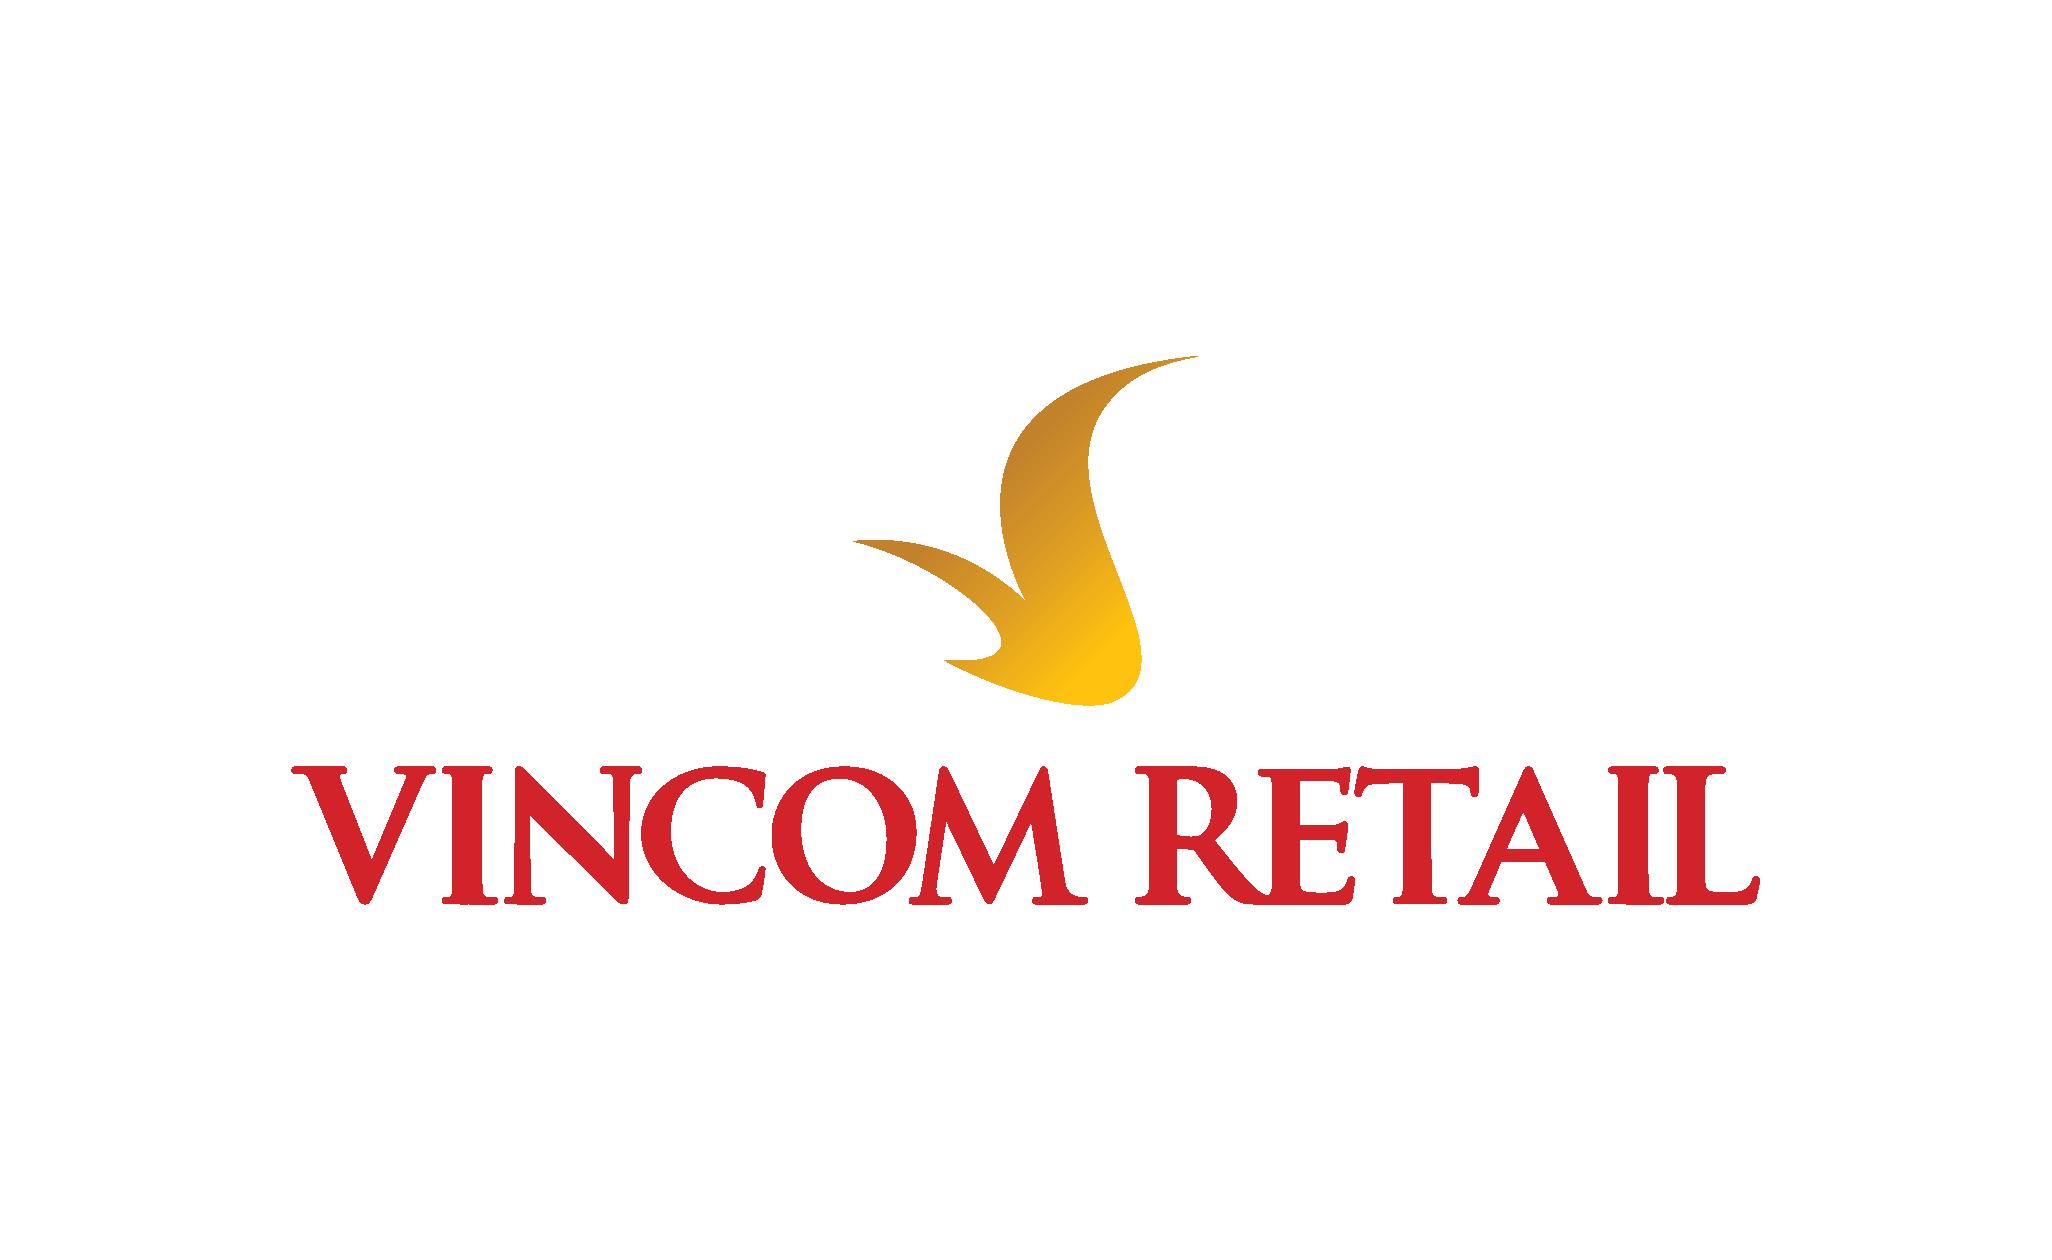 Vincom Retail - a Vingroup company